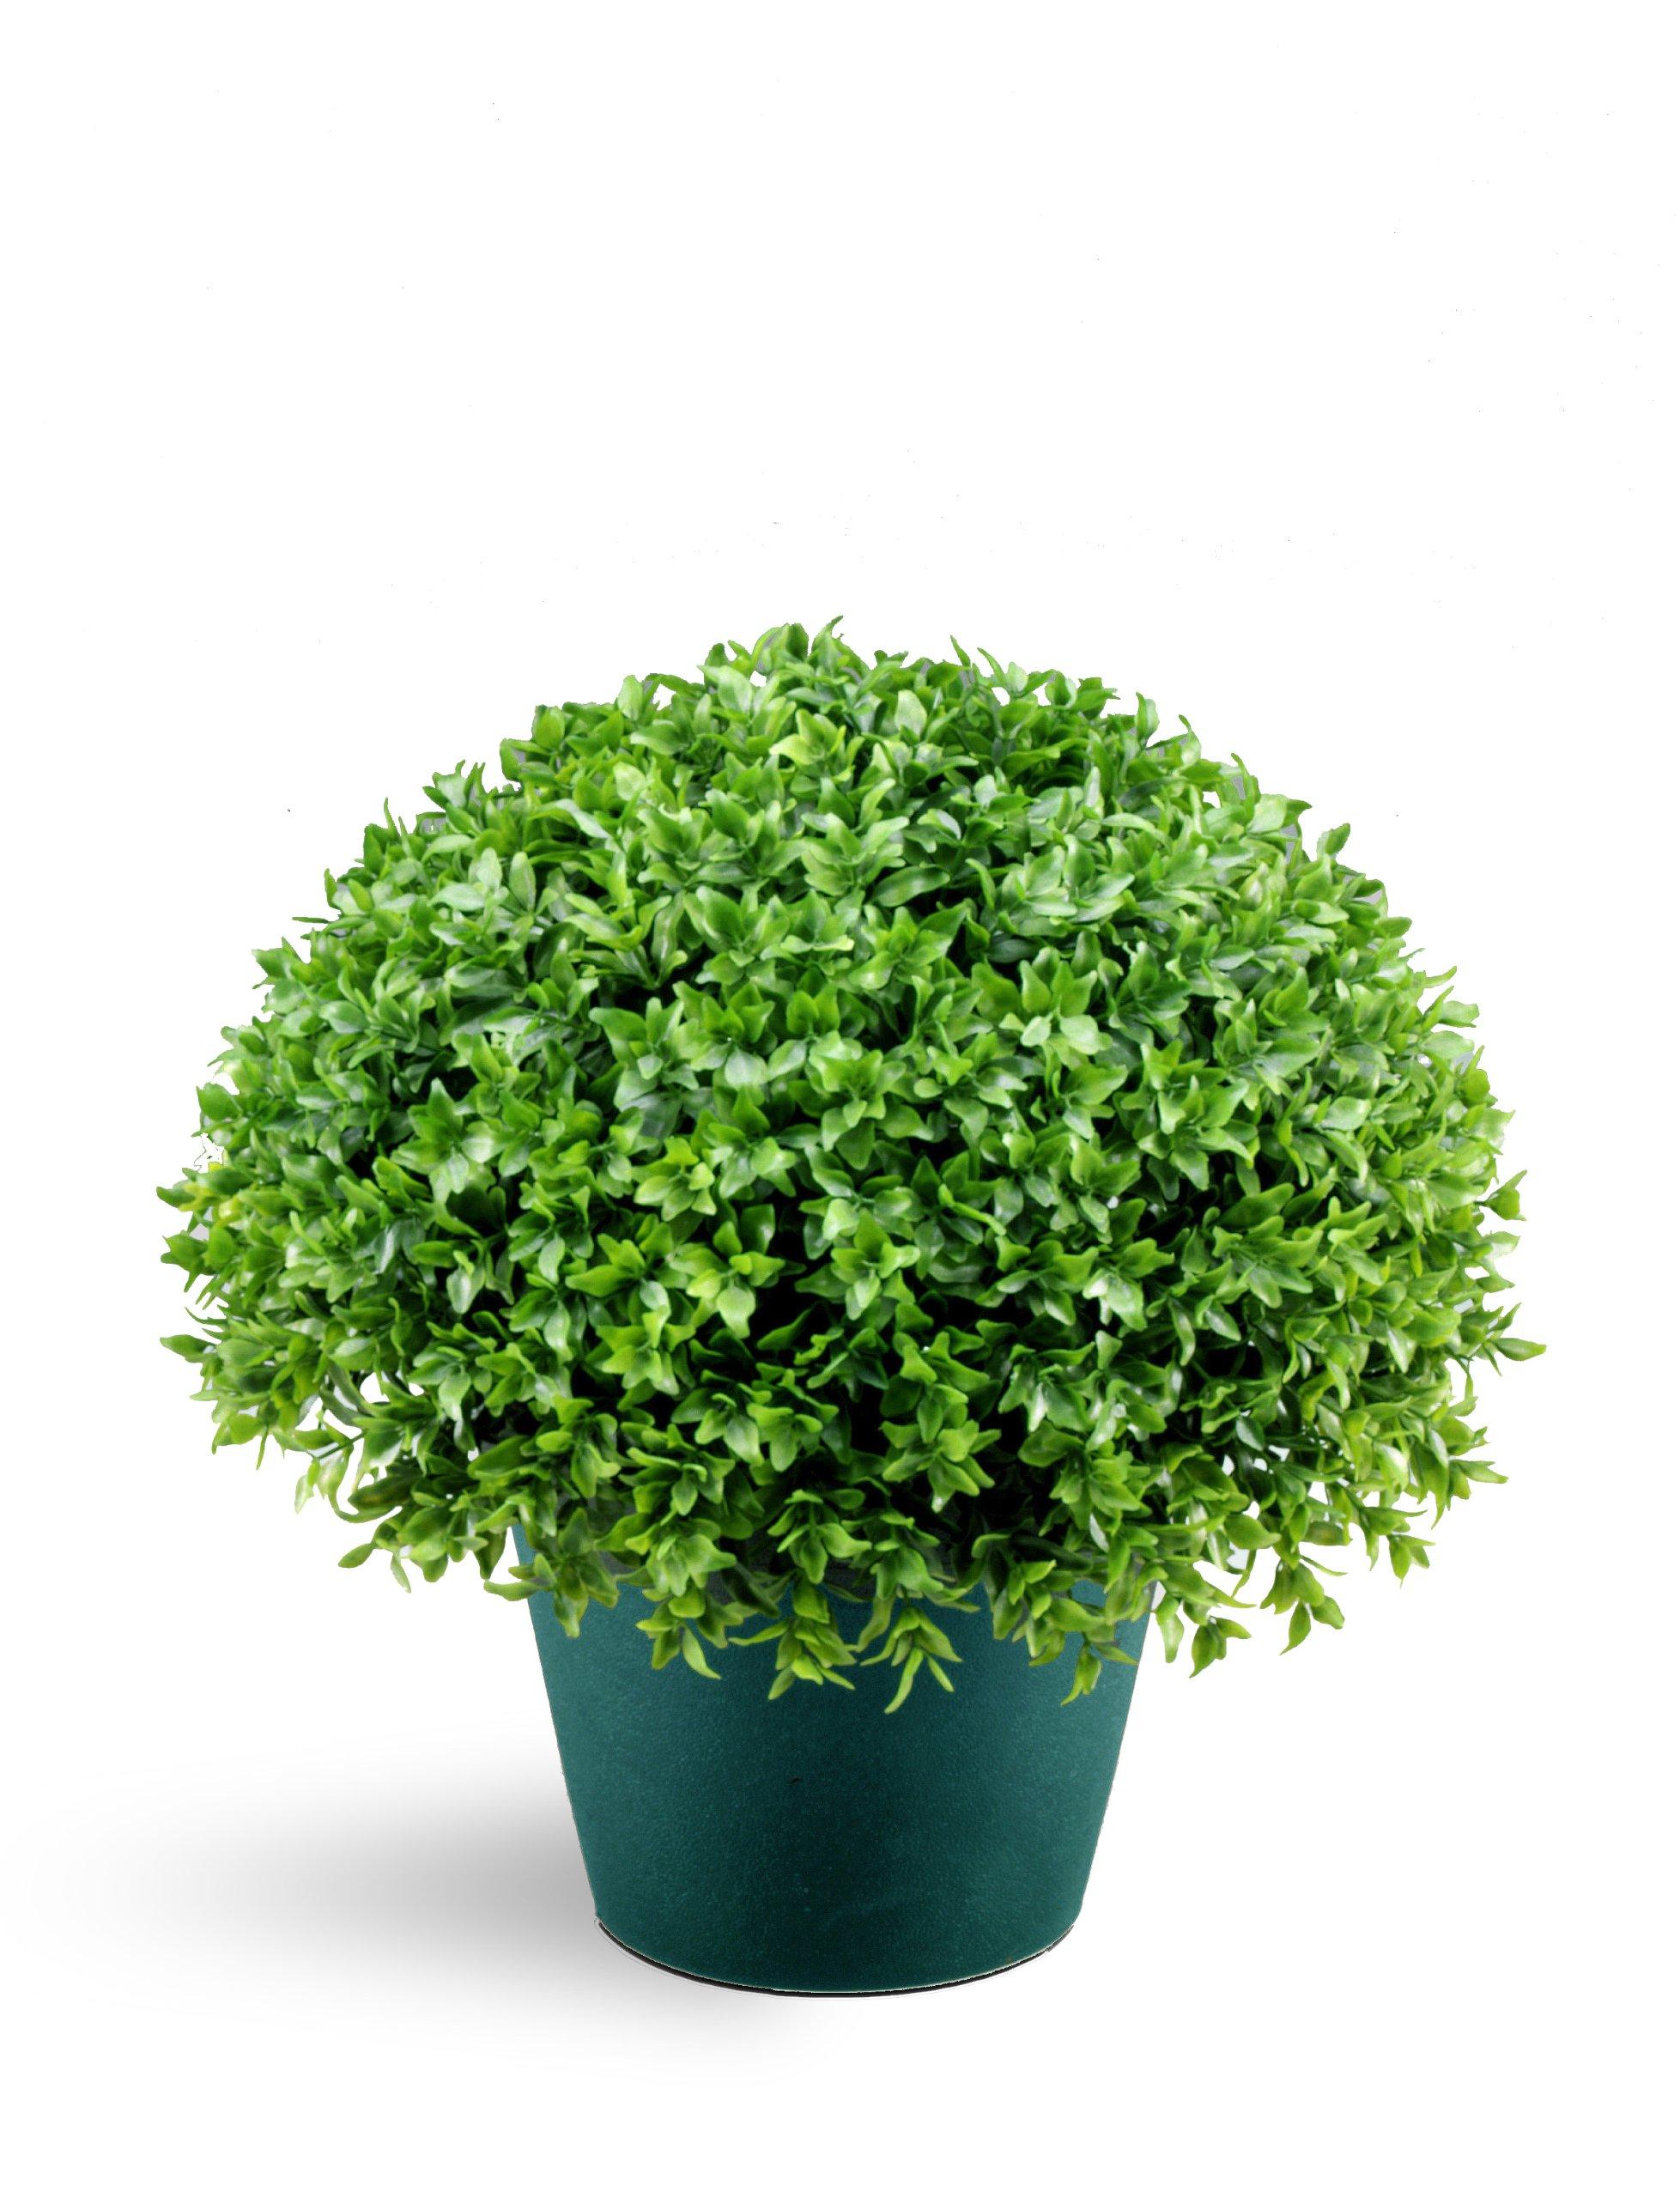 National Tree 13 Inch Globe Japanese Holly Bush in Dark Green Round Plastic Pot (LJB4-13-1) by National Tree Company